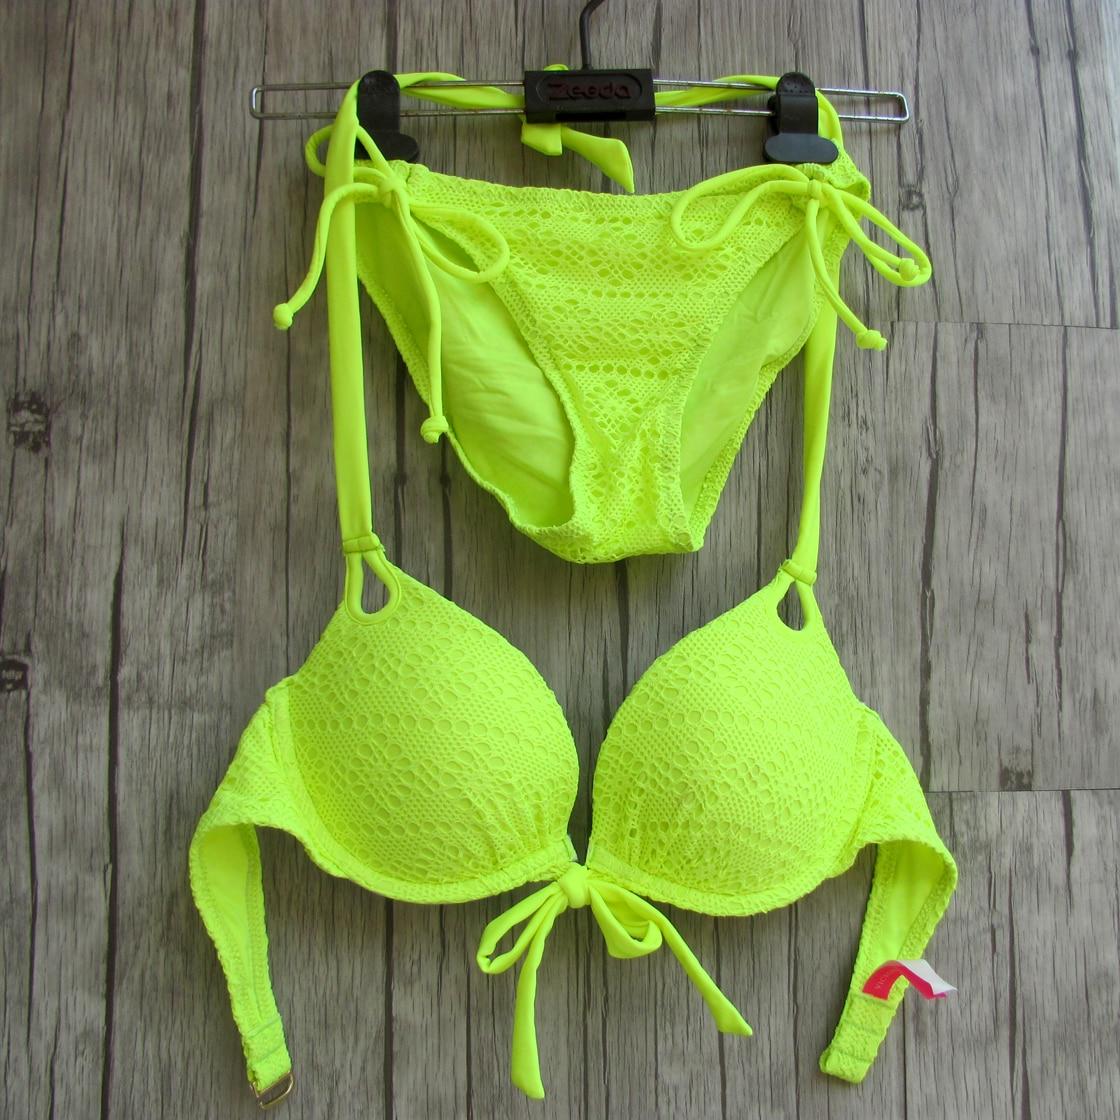 Women Bikini Fluorescent Yellow Bathing suits Sexy biqini UNDERWIRE Maillot de bain Low Waist Designs Secret Swimwear<br><br>Aliexpress